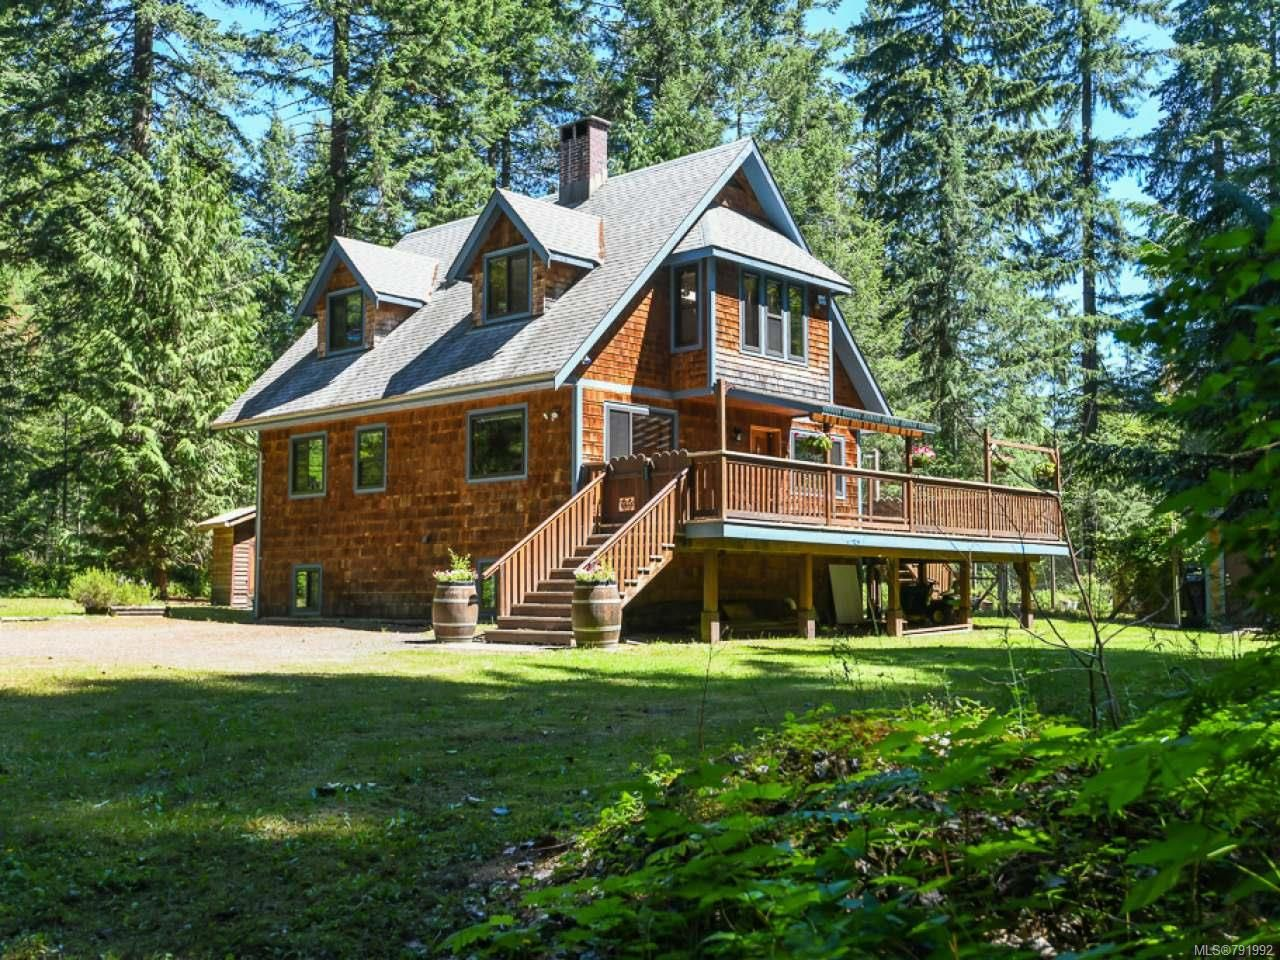 Main Photo: 3875 Dohm Rd in BLACK CREEK: CV Merville Black Creek House for sale (Comox Valley)  : MLS®# 791992